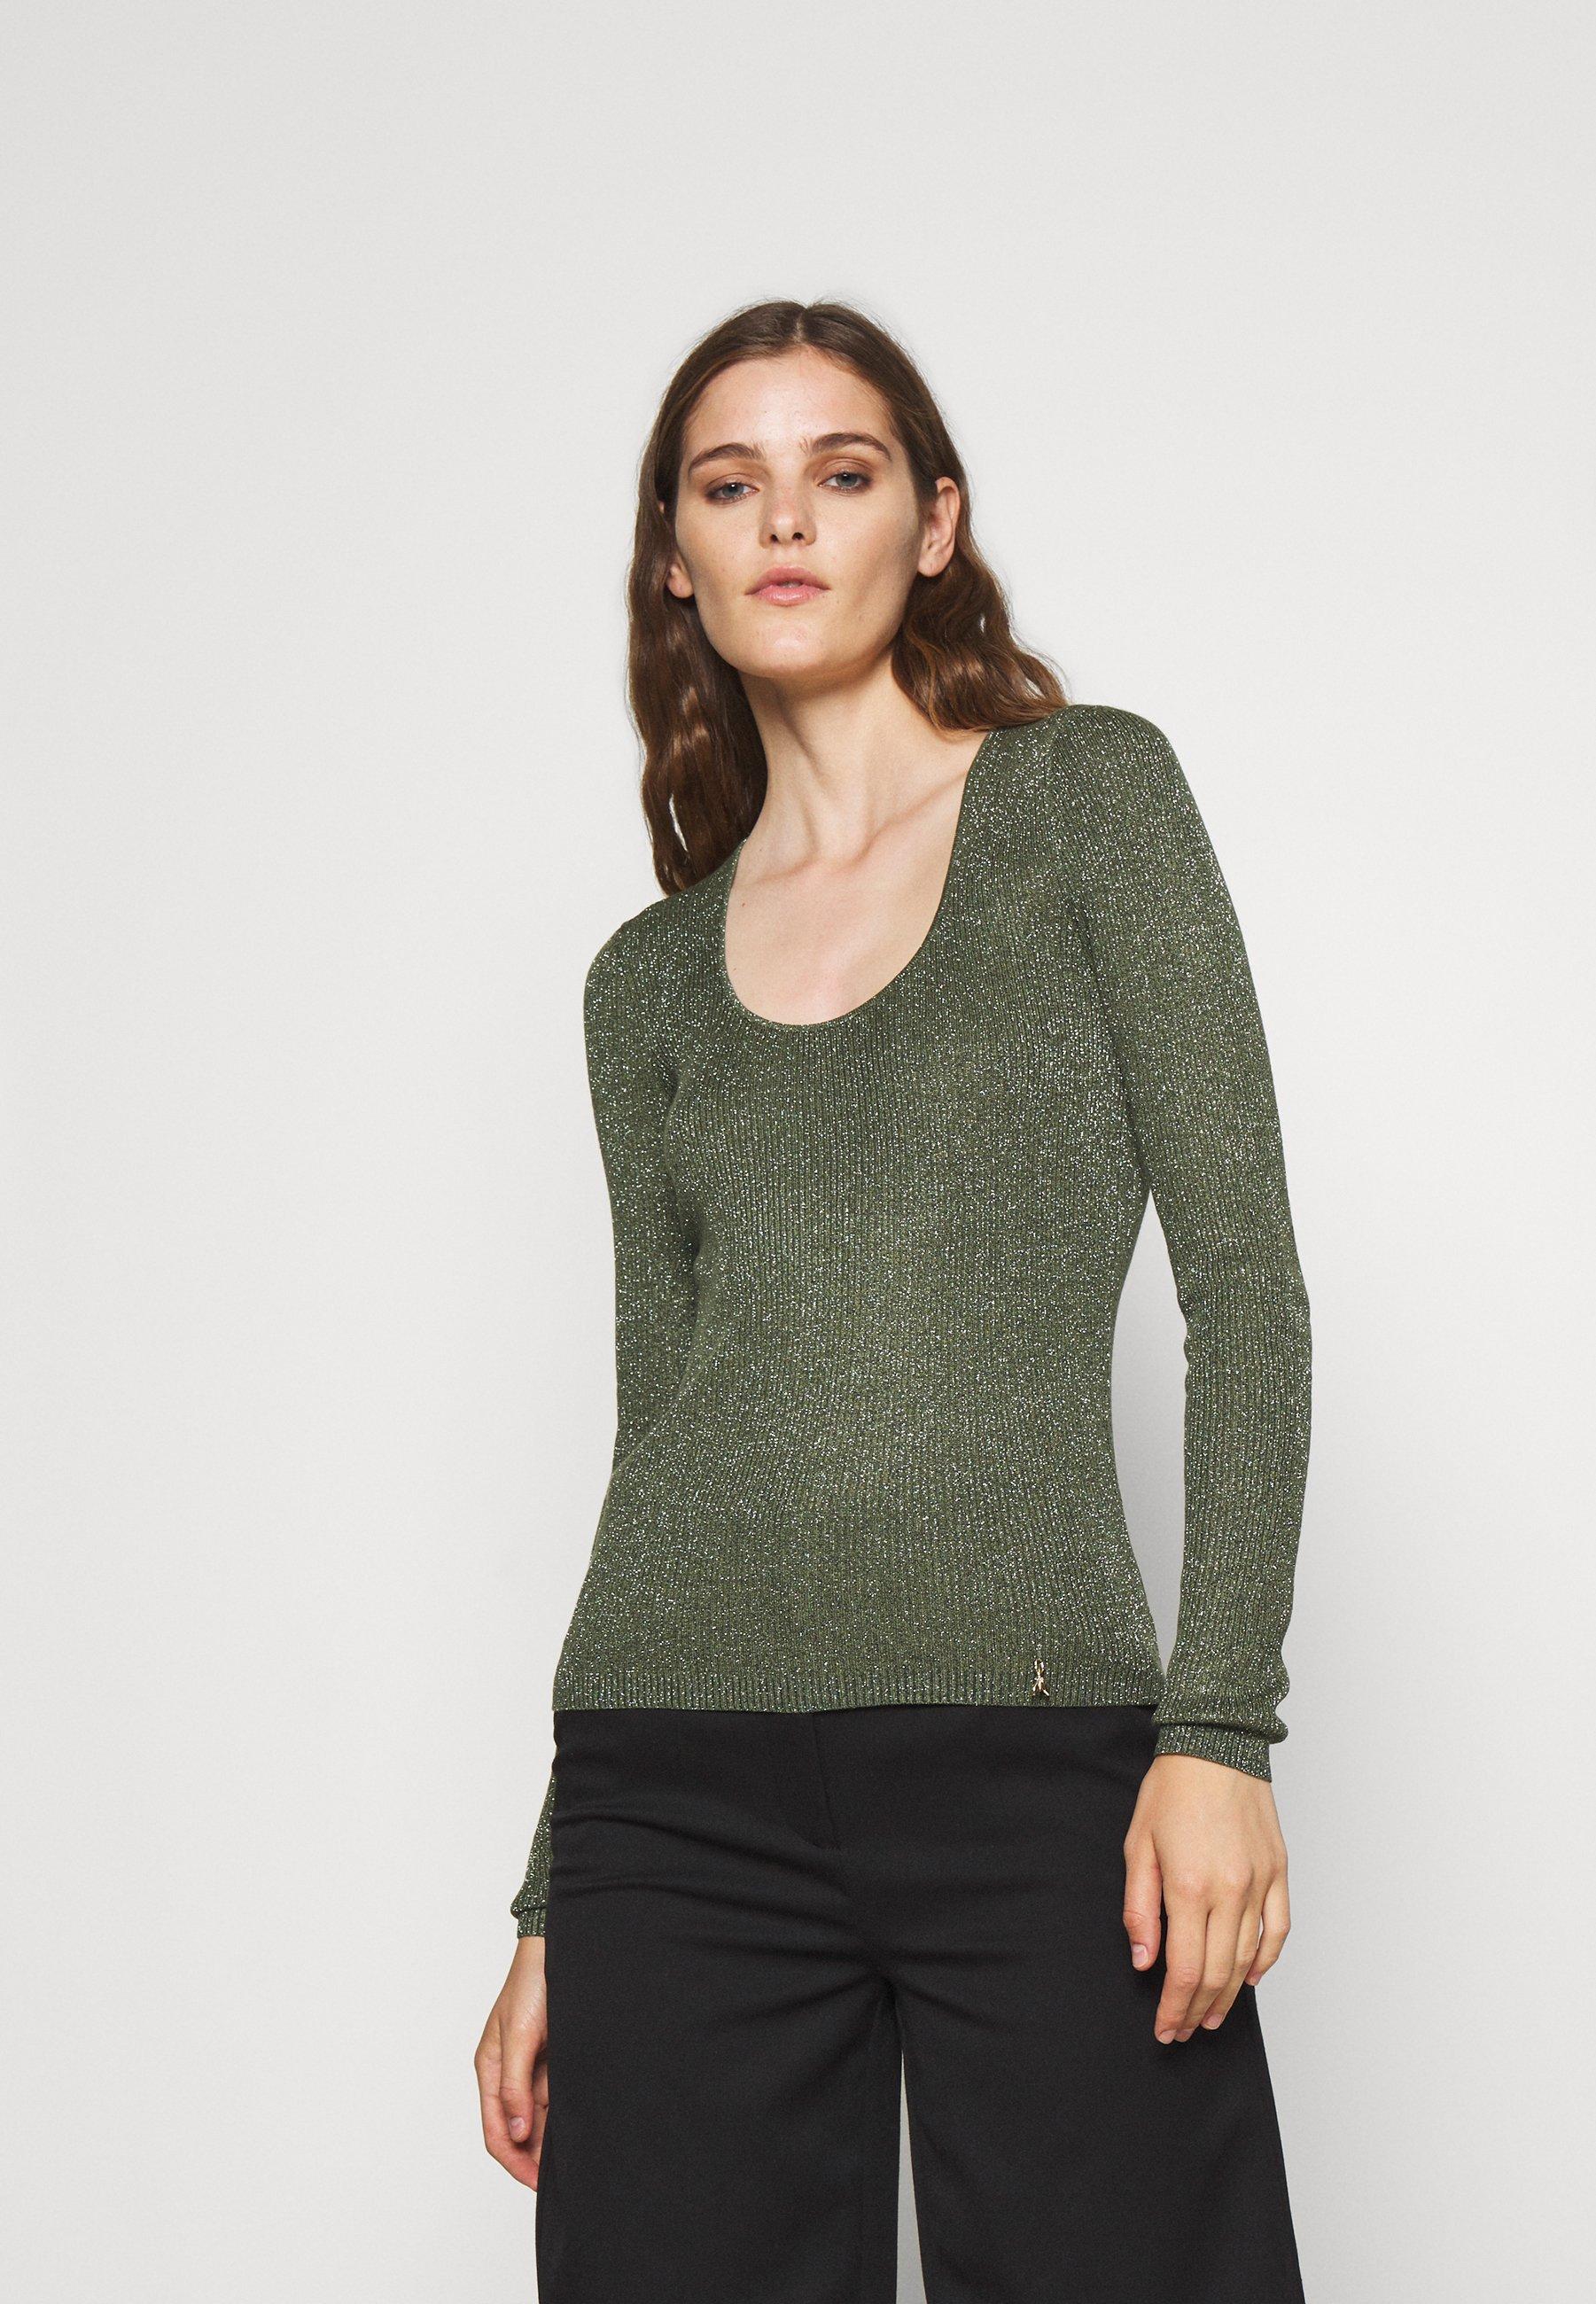 Damen Strickpullover - toscana green